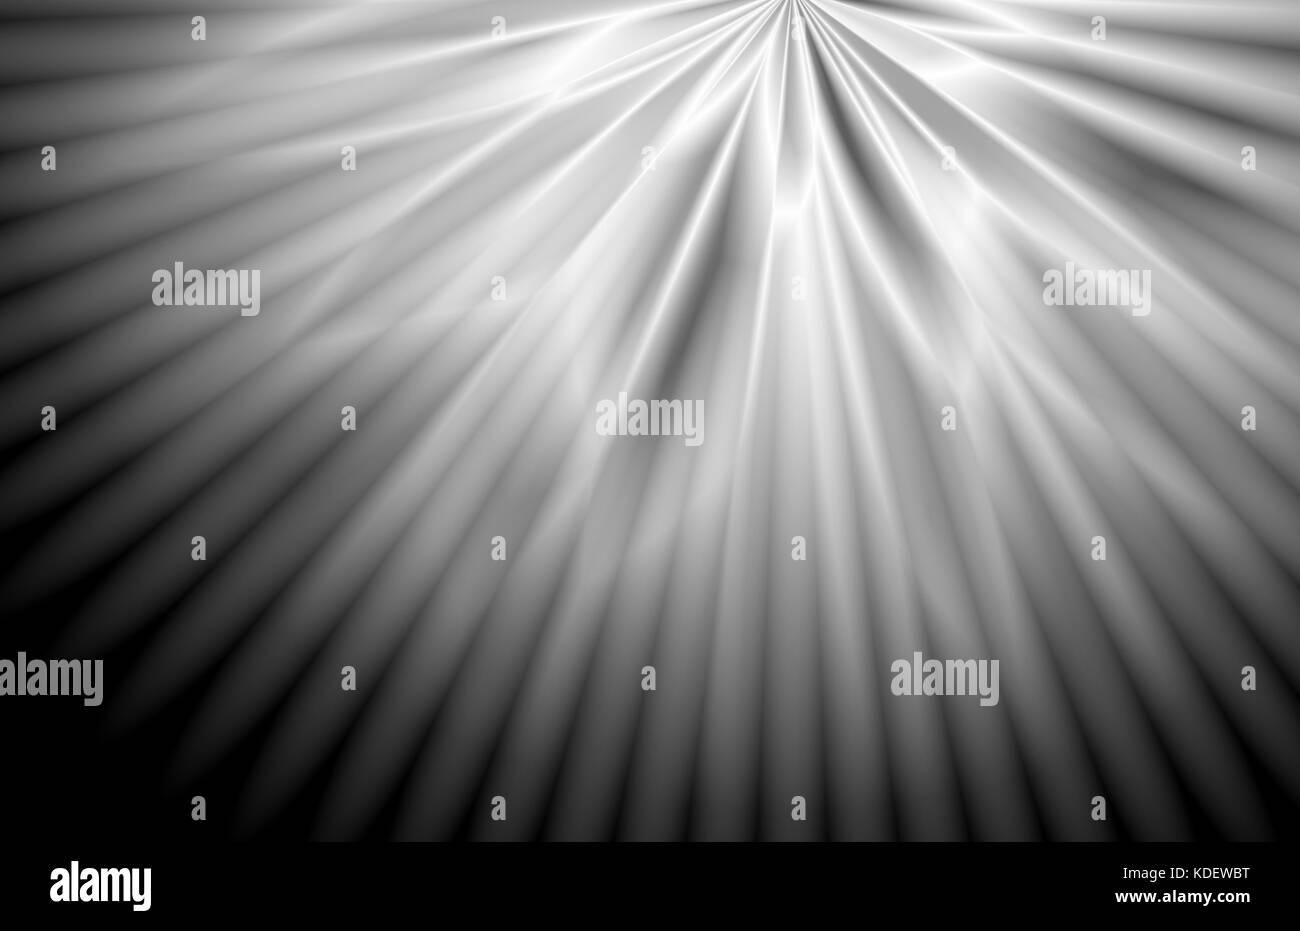 Smooth abstract silver monochrome card backdrop design Stock Photo